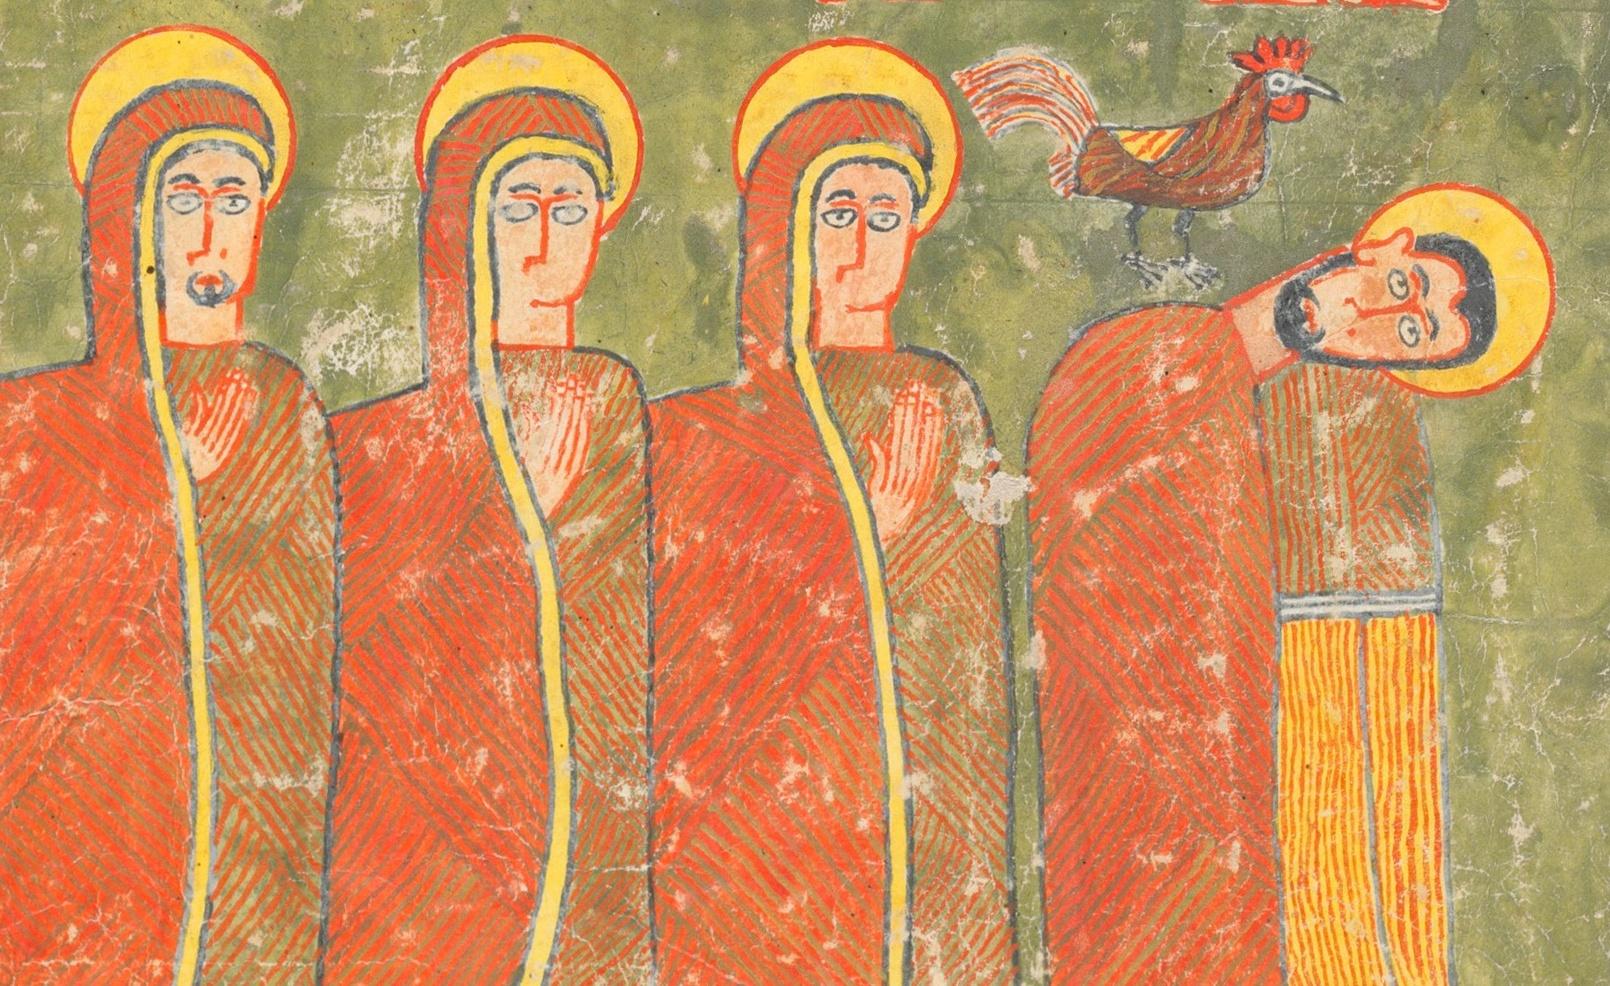 Illuminated Gospel late 14th–early 15th century, Amhara peoples (detail)